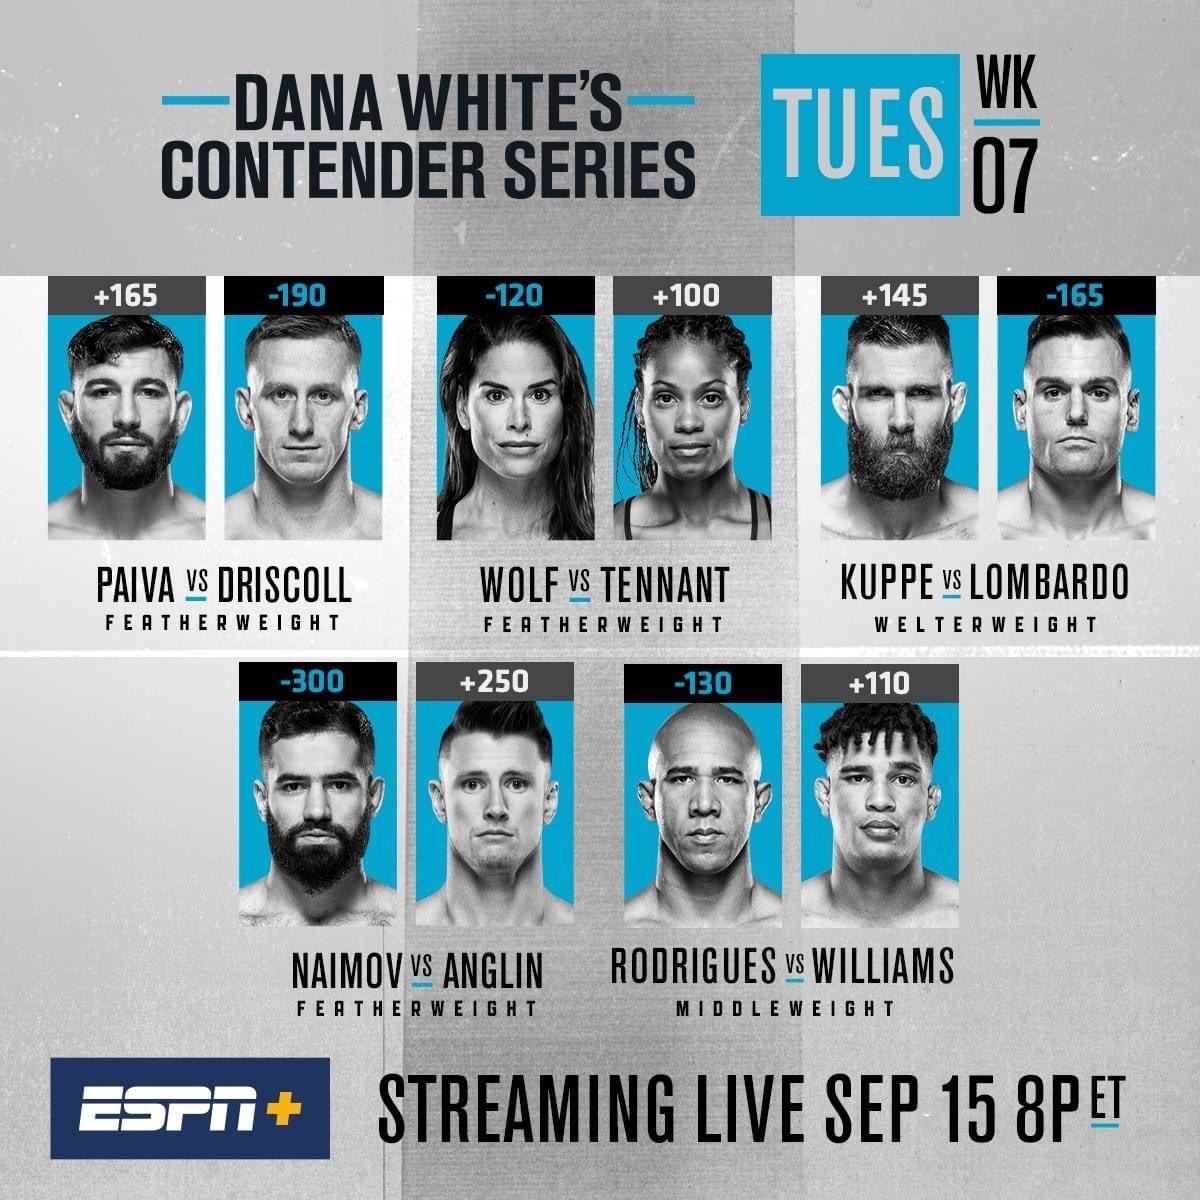 #NowWatching - Dana White's Contender Series 33 #UFC #DanaWhitesContenderSeries33 #DWCS #DWCS33 #UFCLasVegas #ESPNPlus #MMA https://t.co/fByc8IubGh